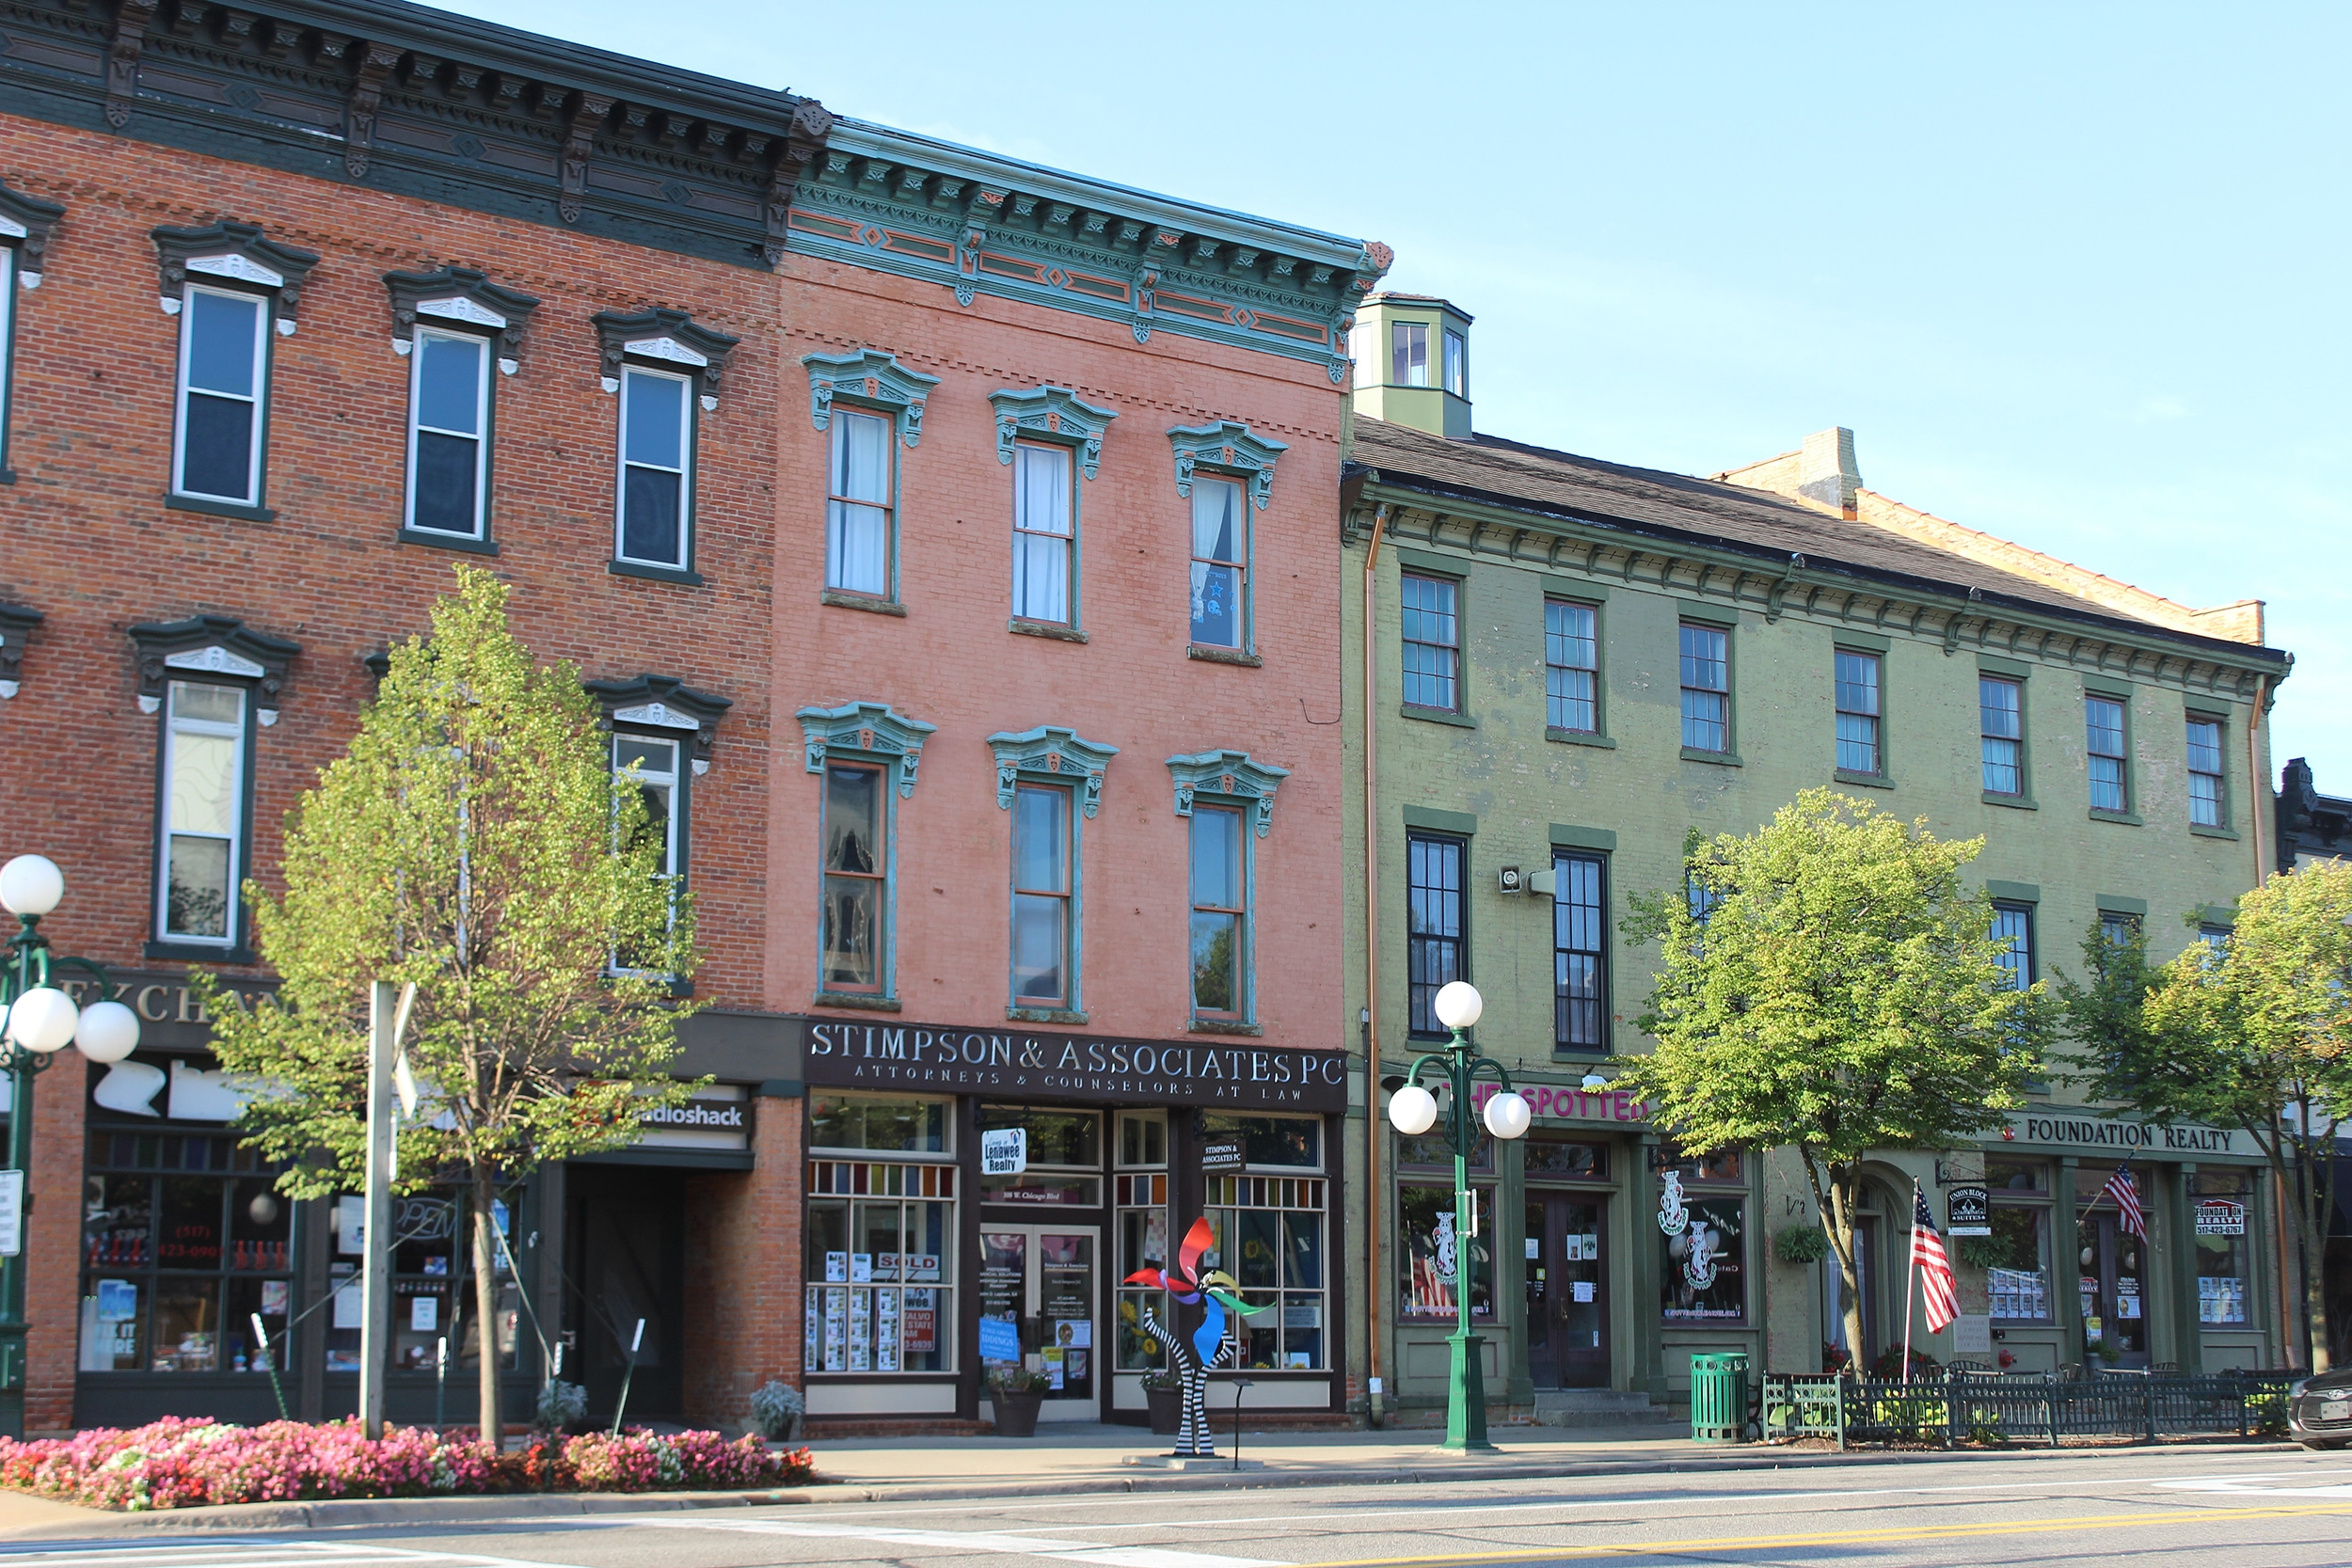 Stimpson and Associates building